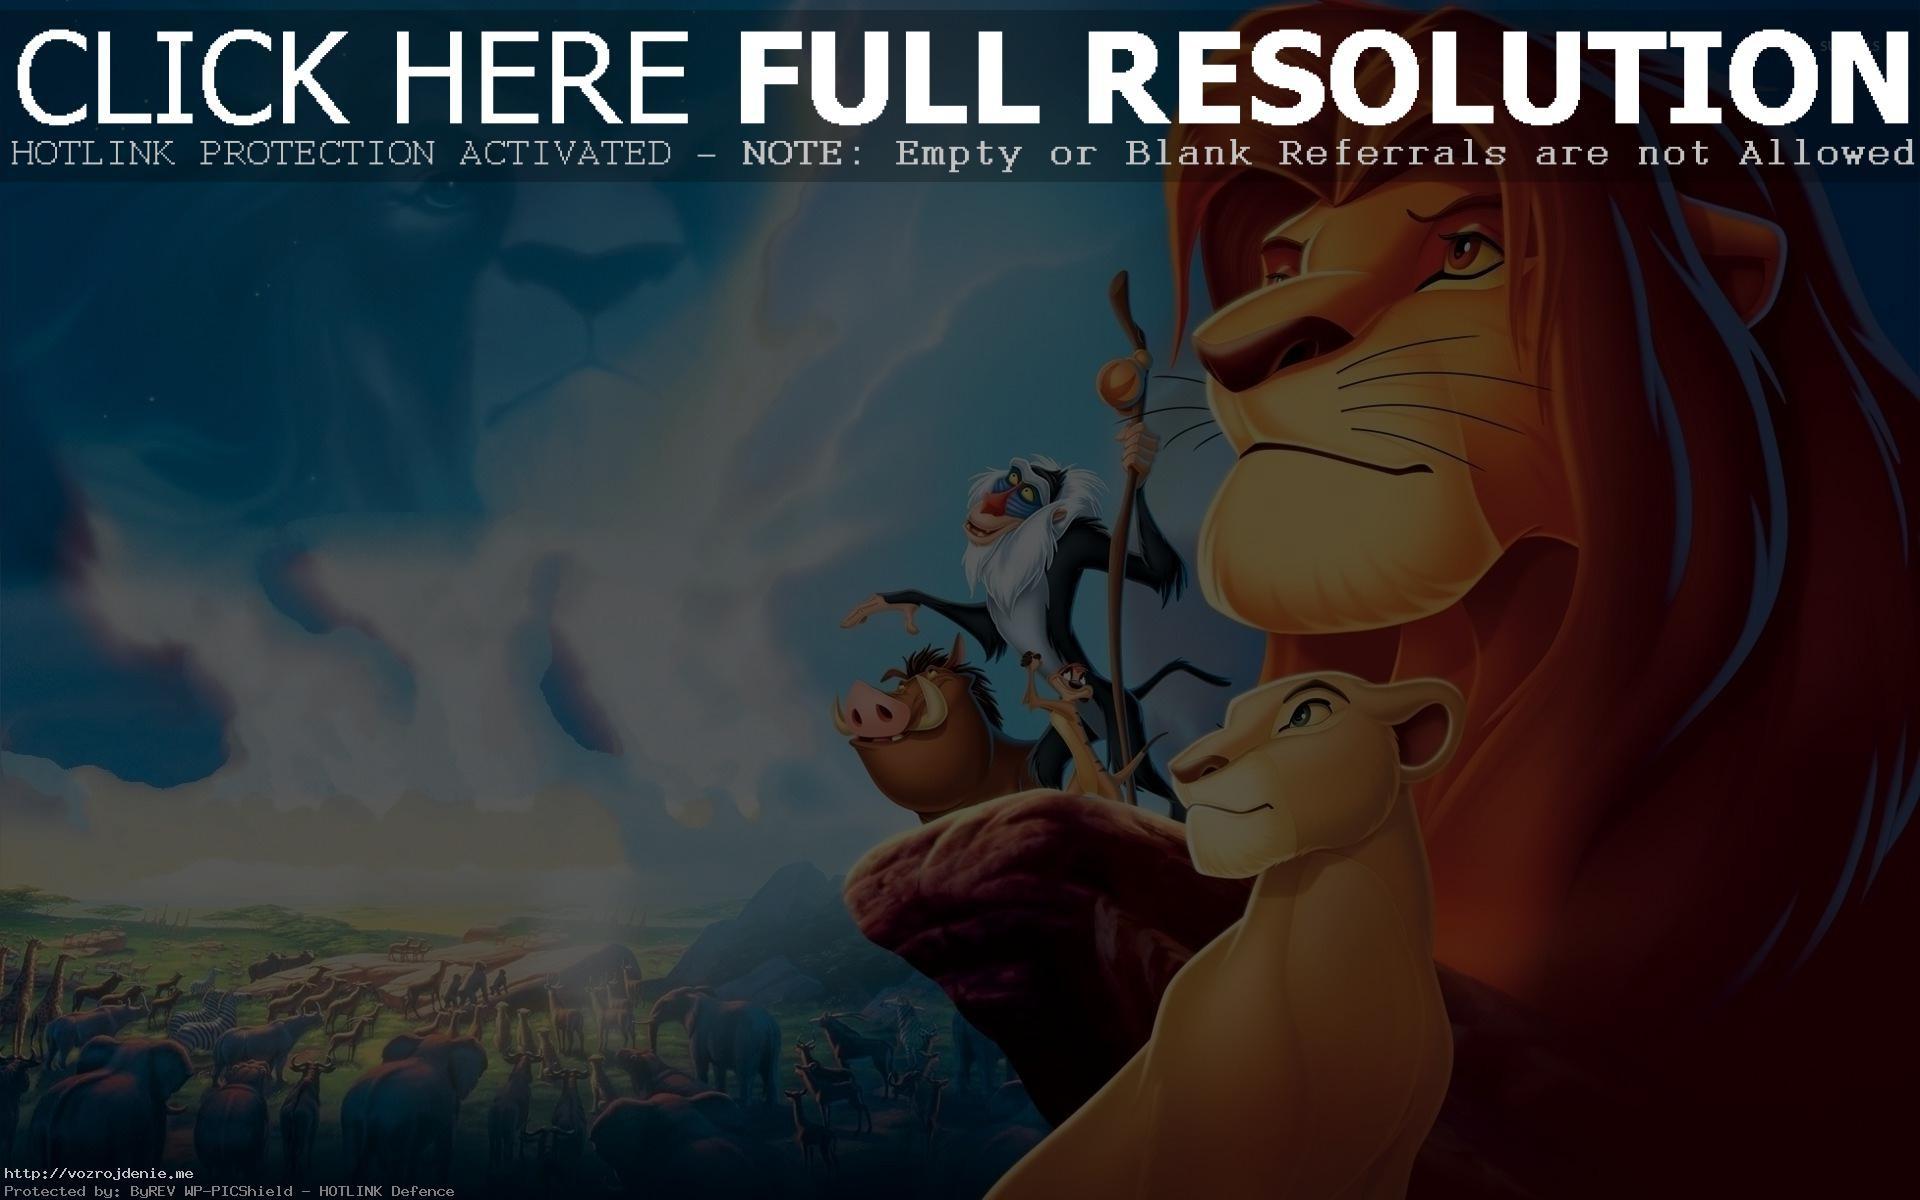 Lion King Wallpaper Hd Pics Of Smartphone Cartoons - Warren Street Tube Station , HD Wallpaper & Backgrounds